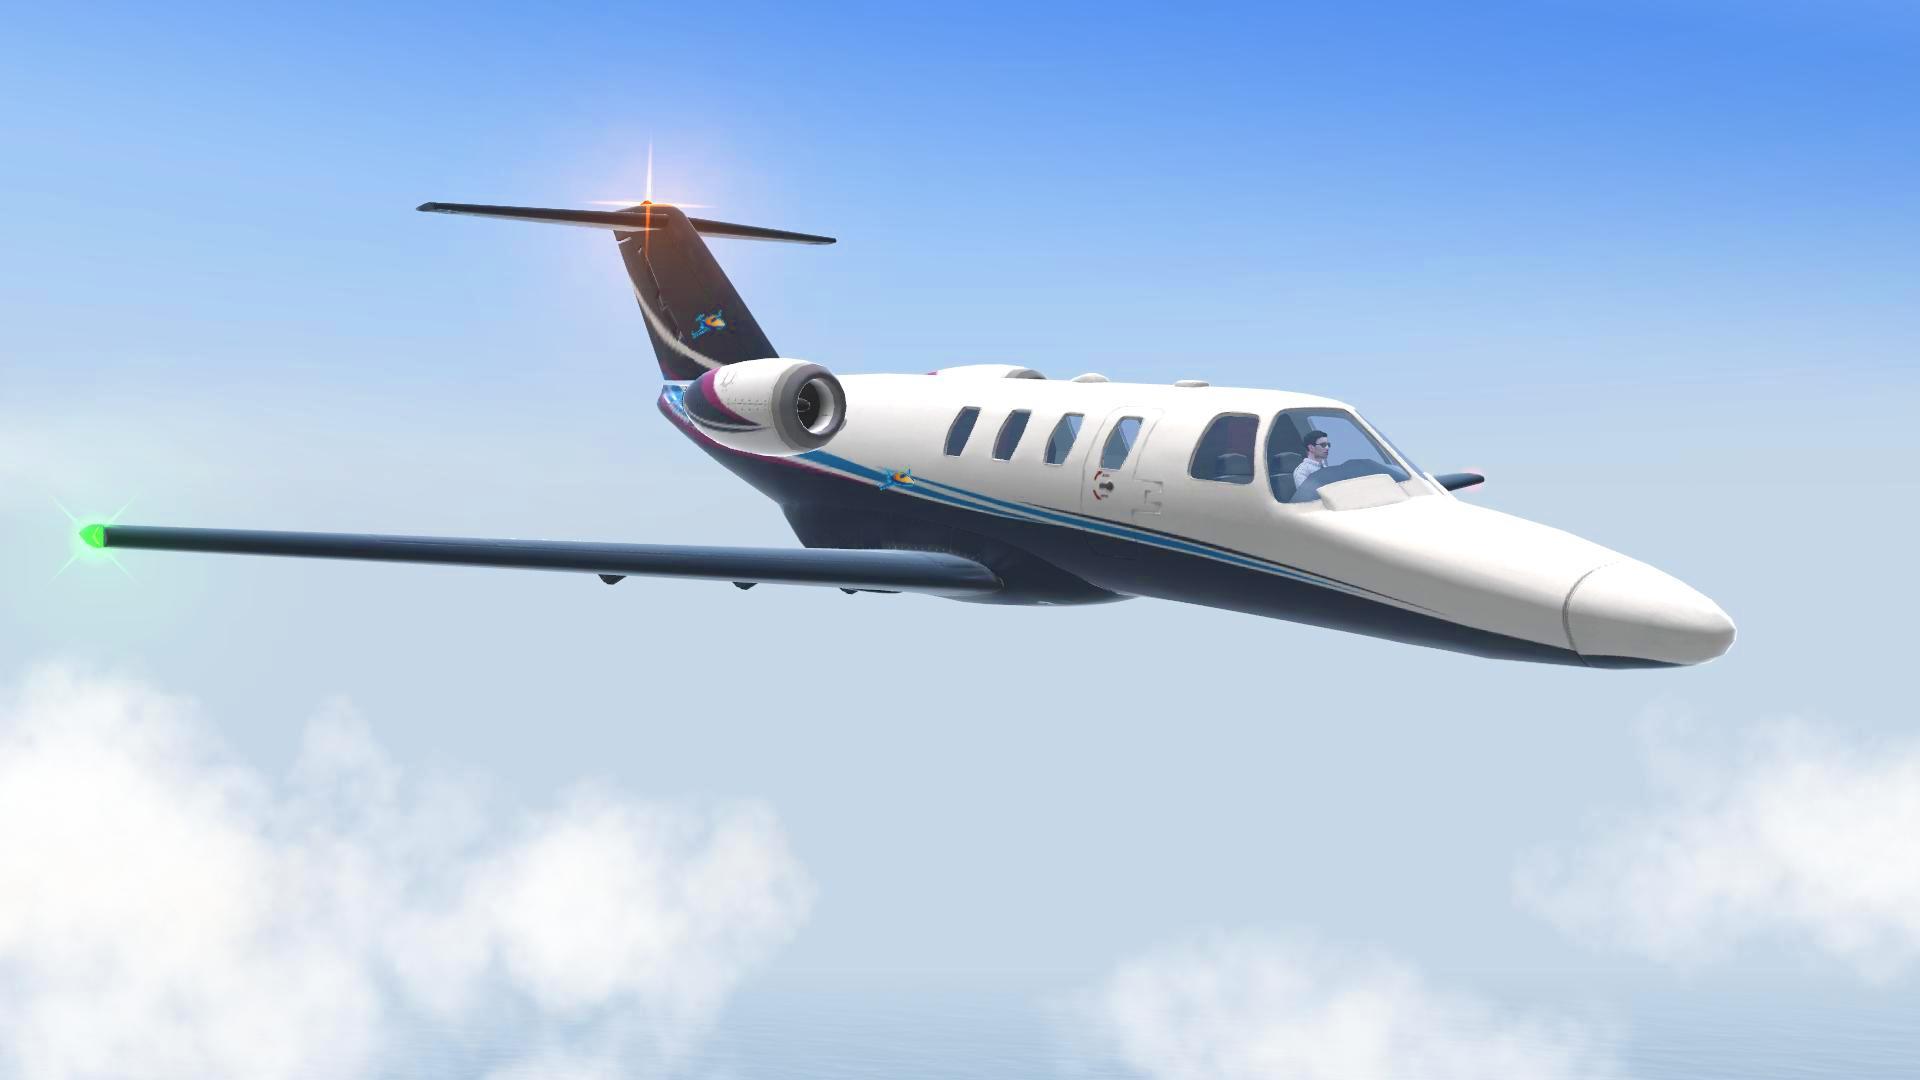 Take Off The Flight Simulator torrent download - SKIDROW PC free